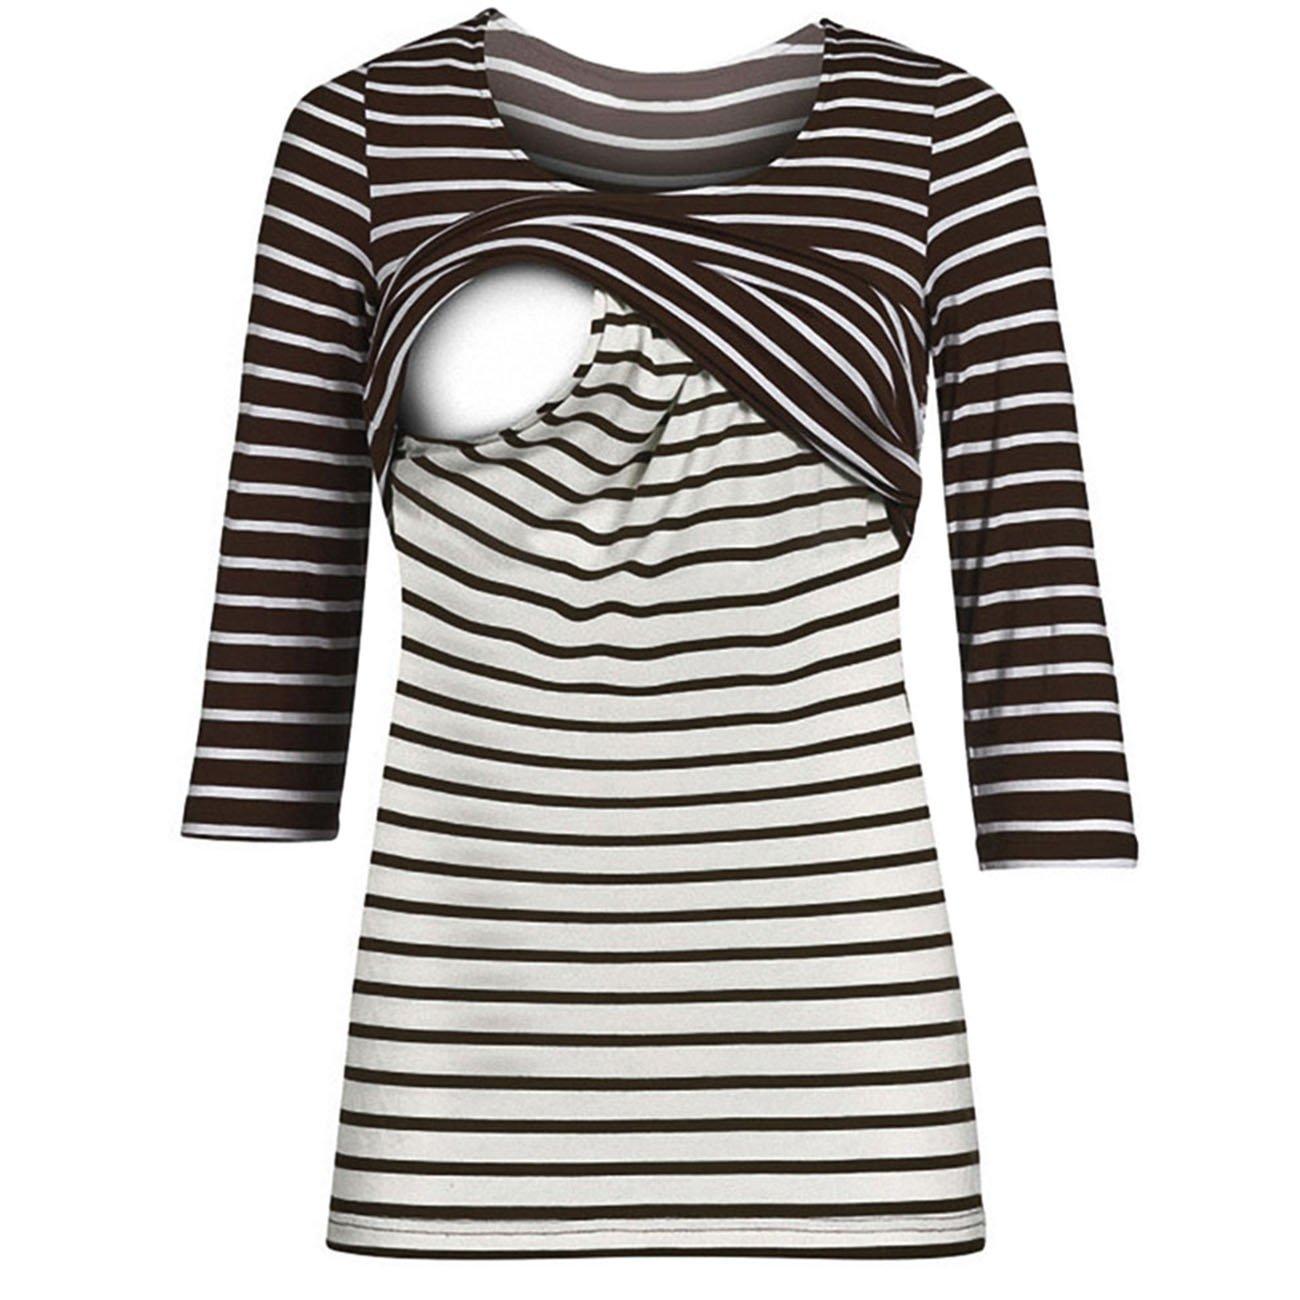 Babe Maps Women's Maternity Striped Nursing Sweatshirt Short Sleeve Breastfeeding